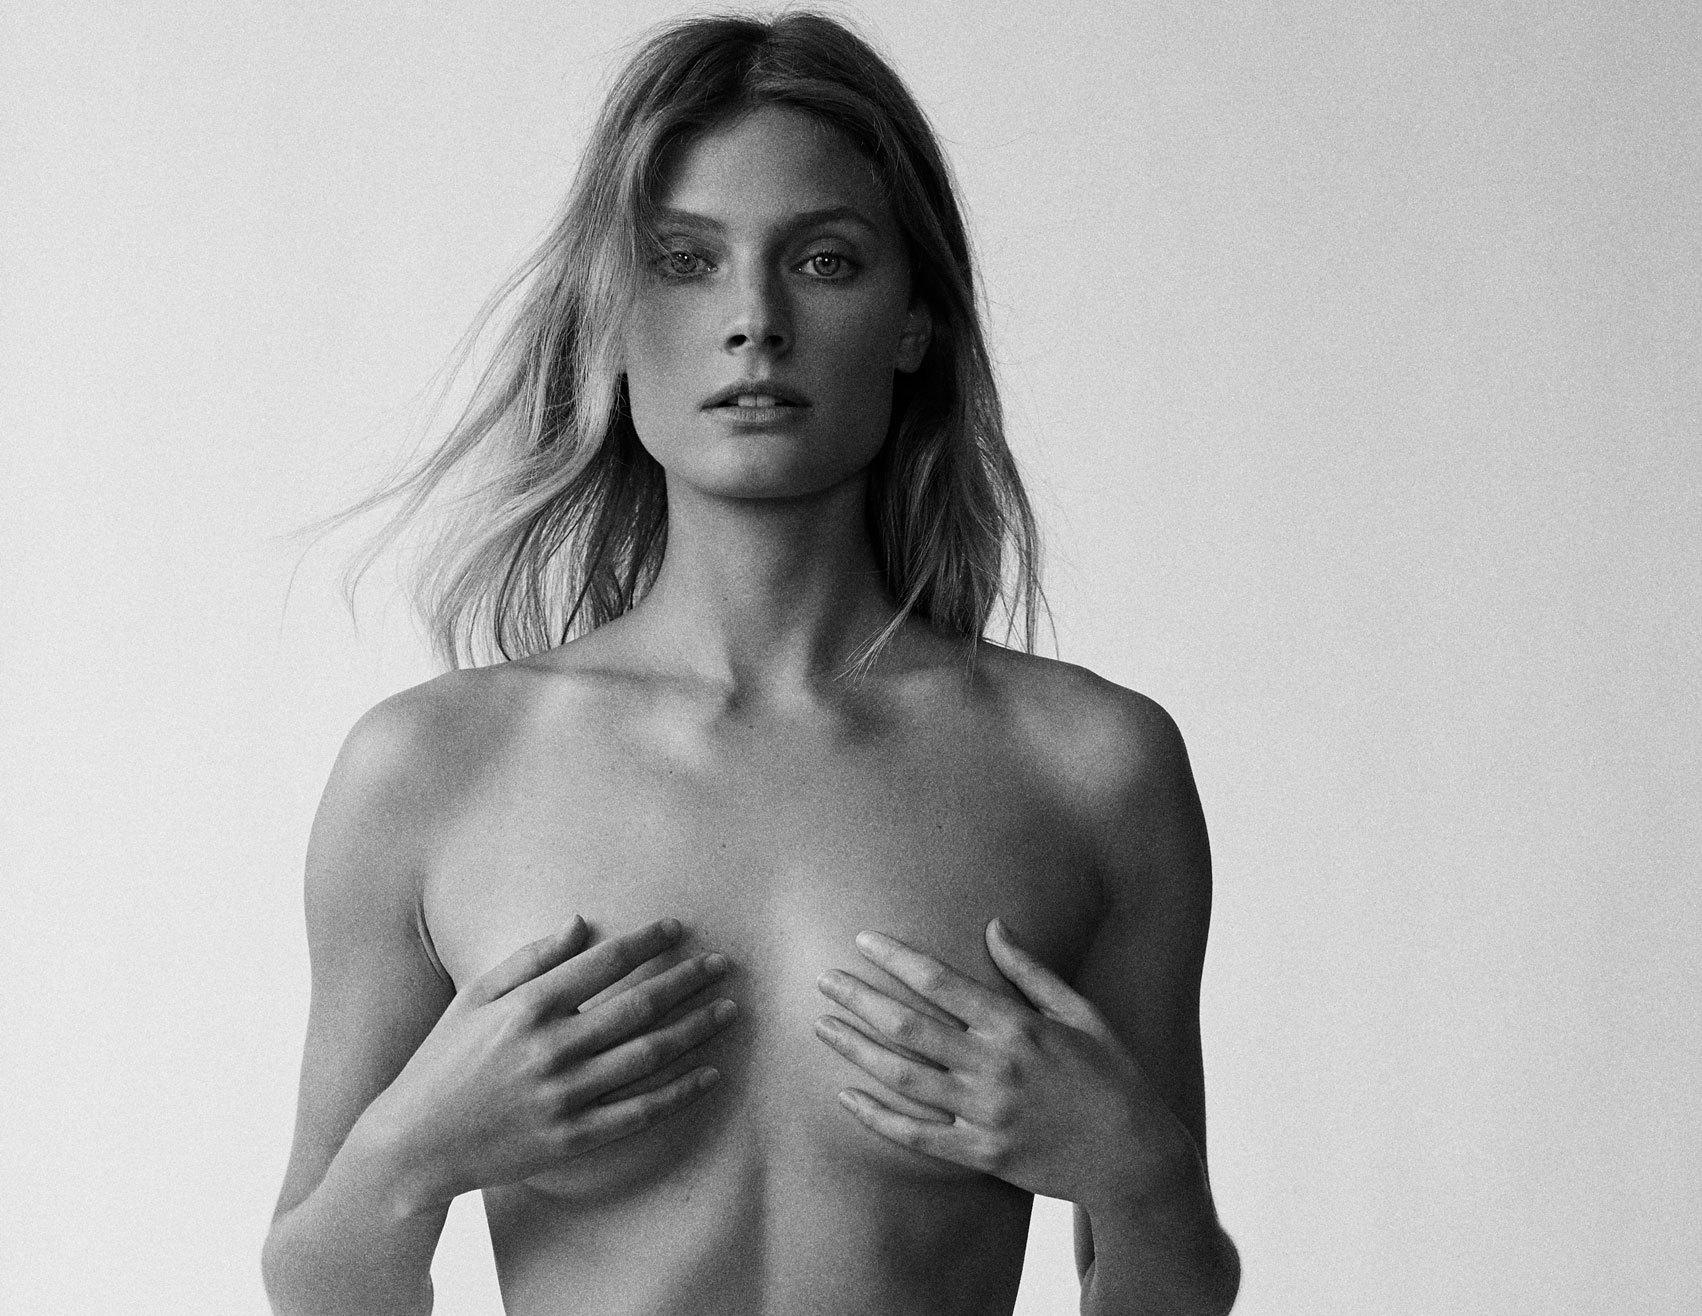 headed-girl-topless-fashion-model-free